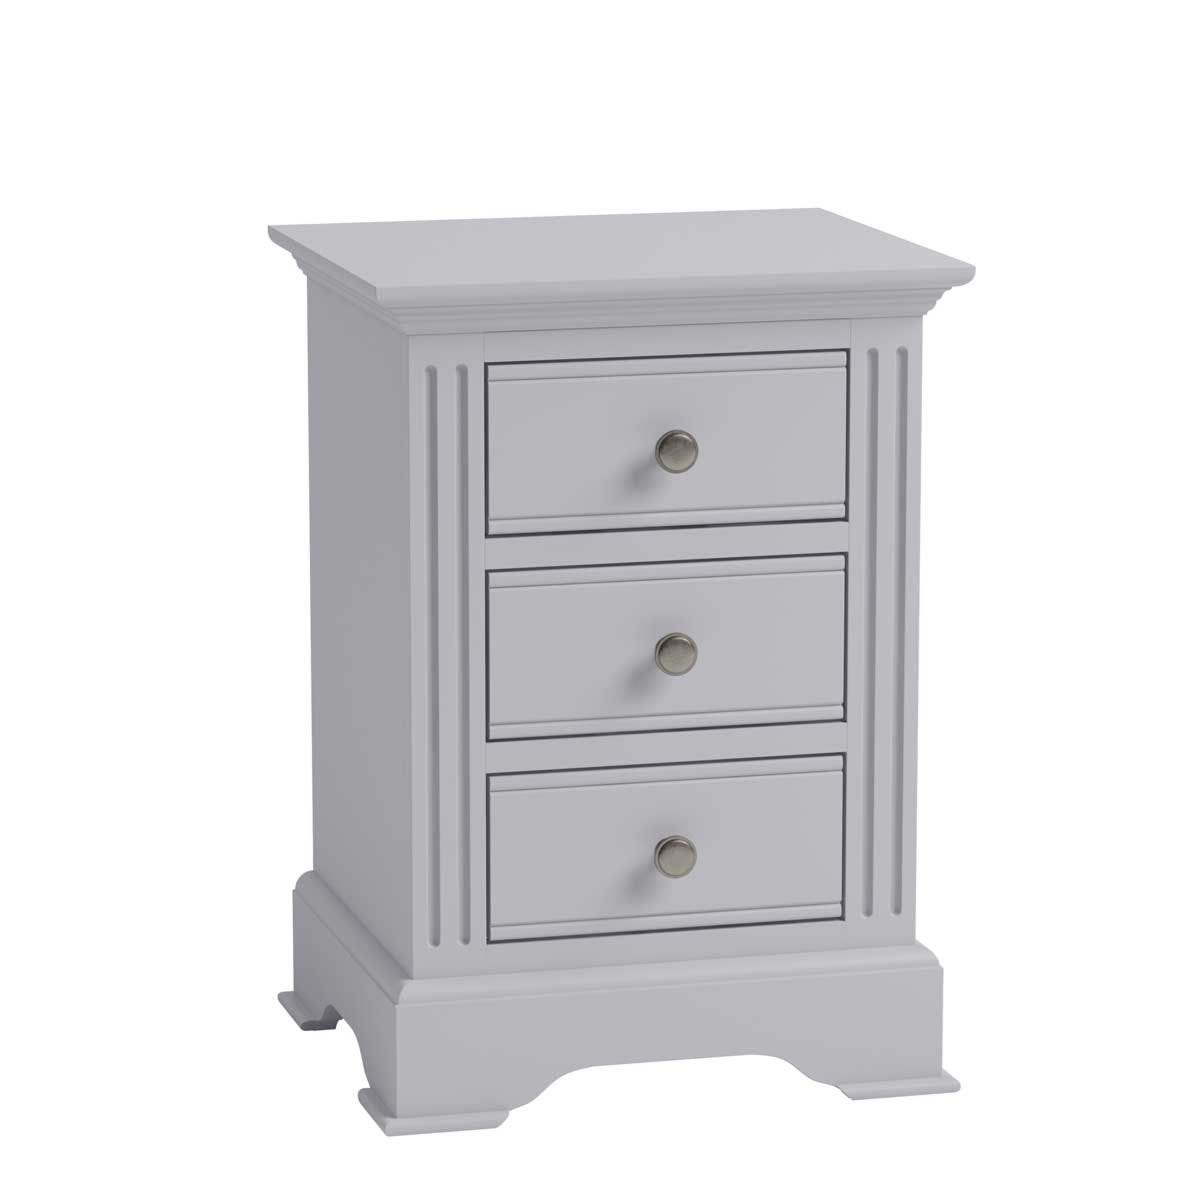 Bingley Large Bedside Cabinet - Grey